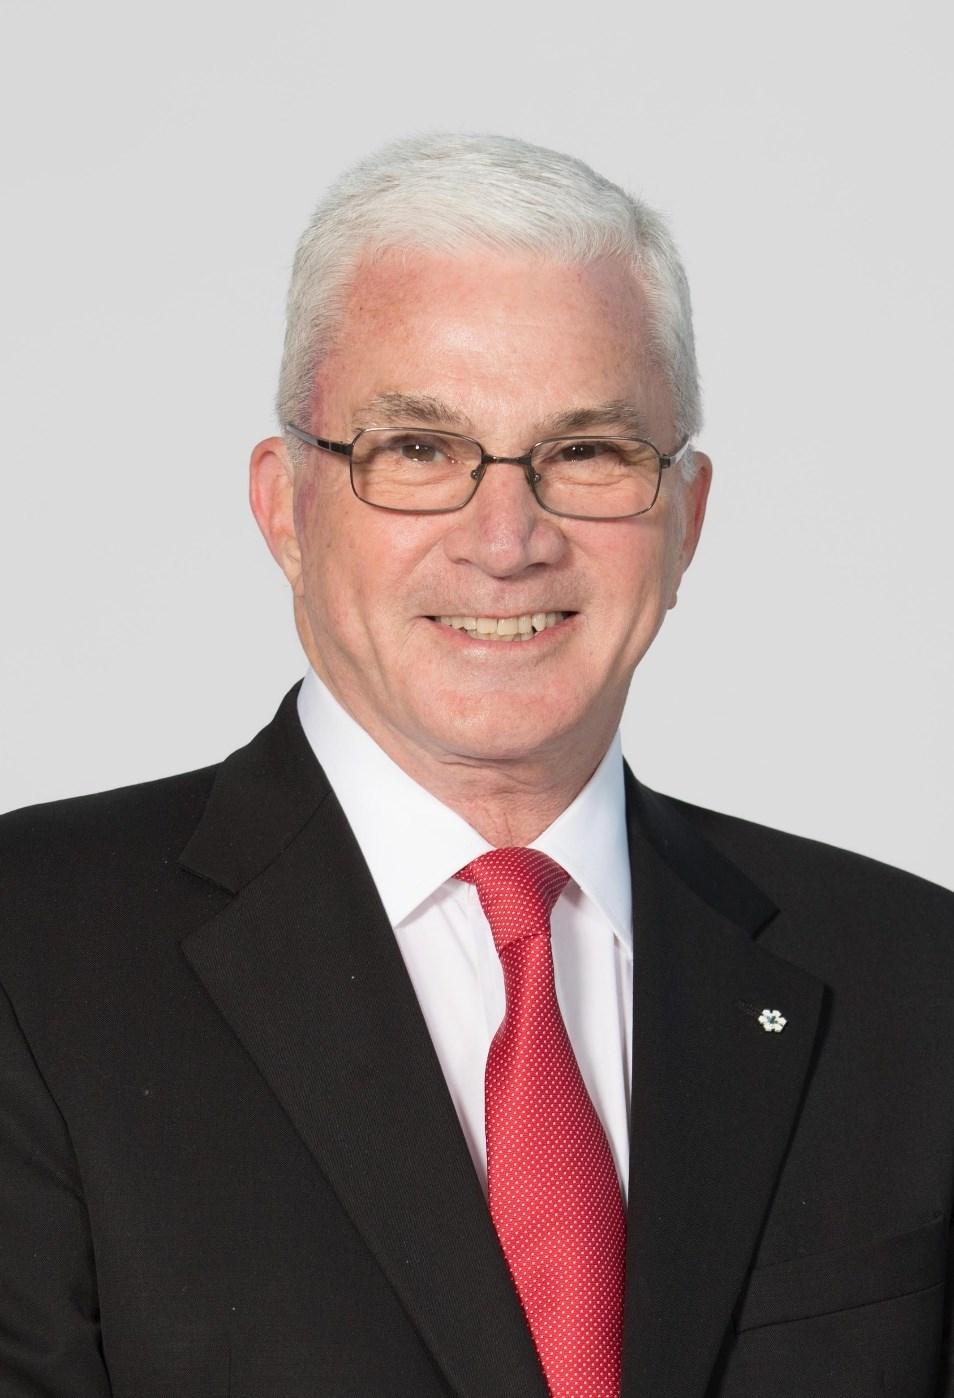 Departing CSE Chairman Thomas S. Caldwell